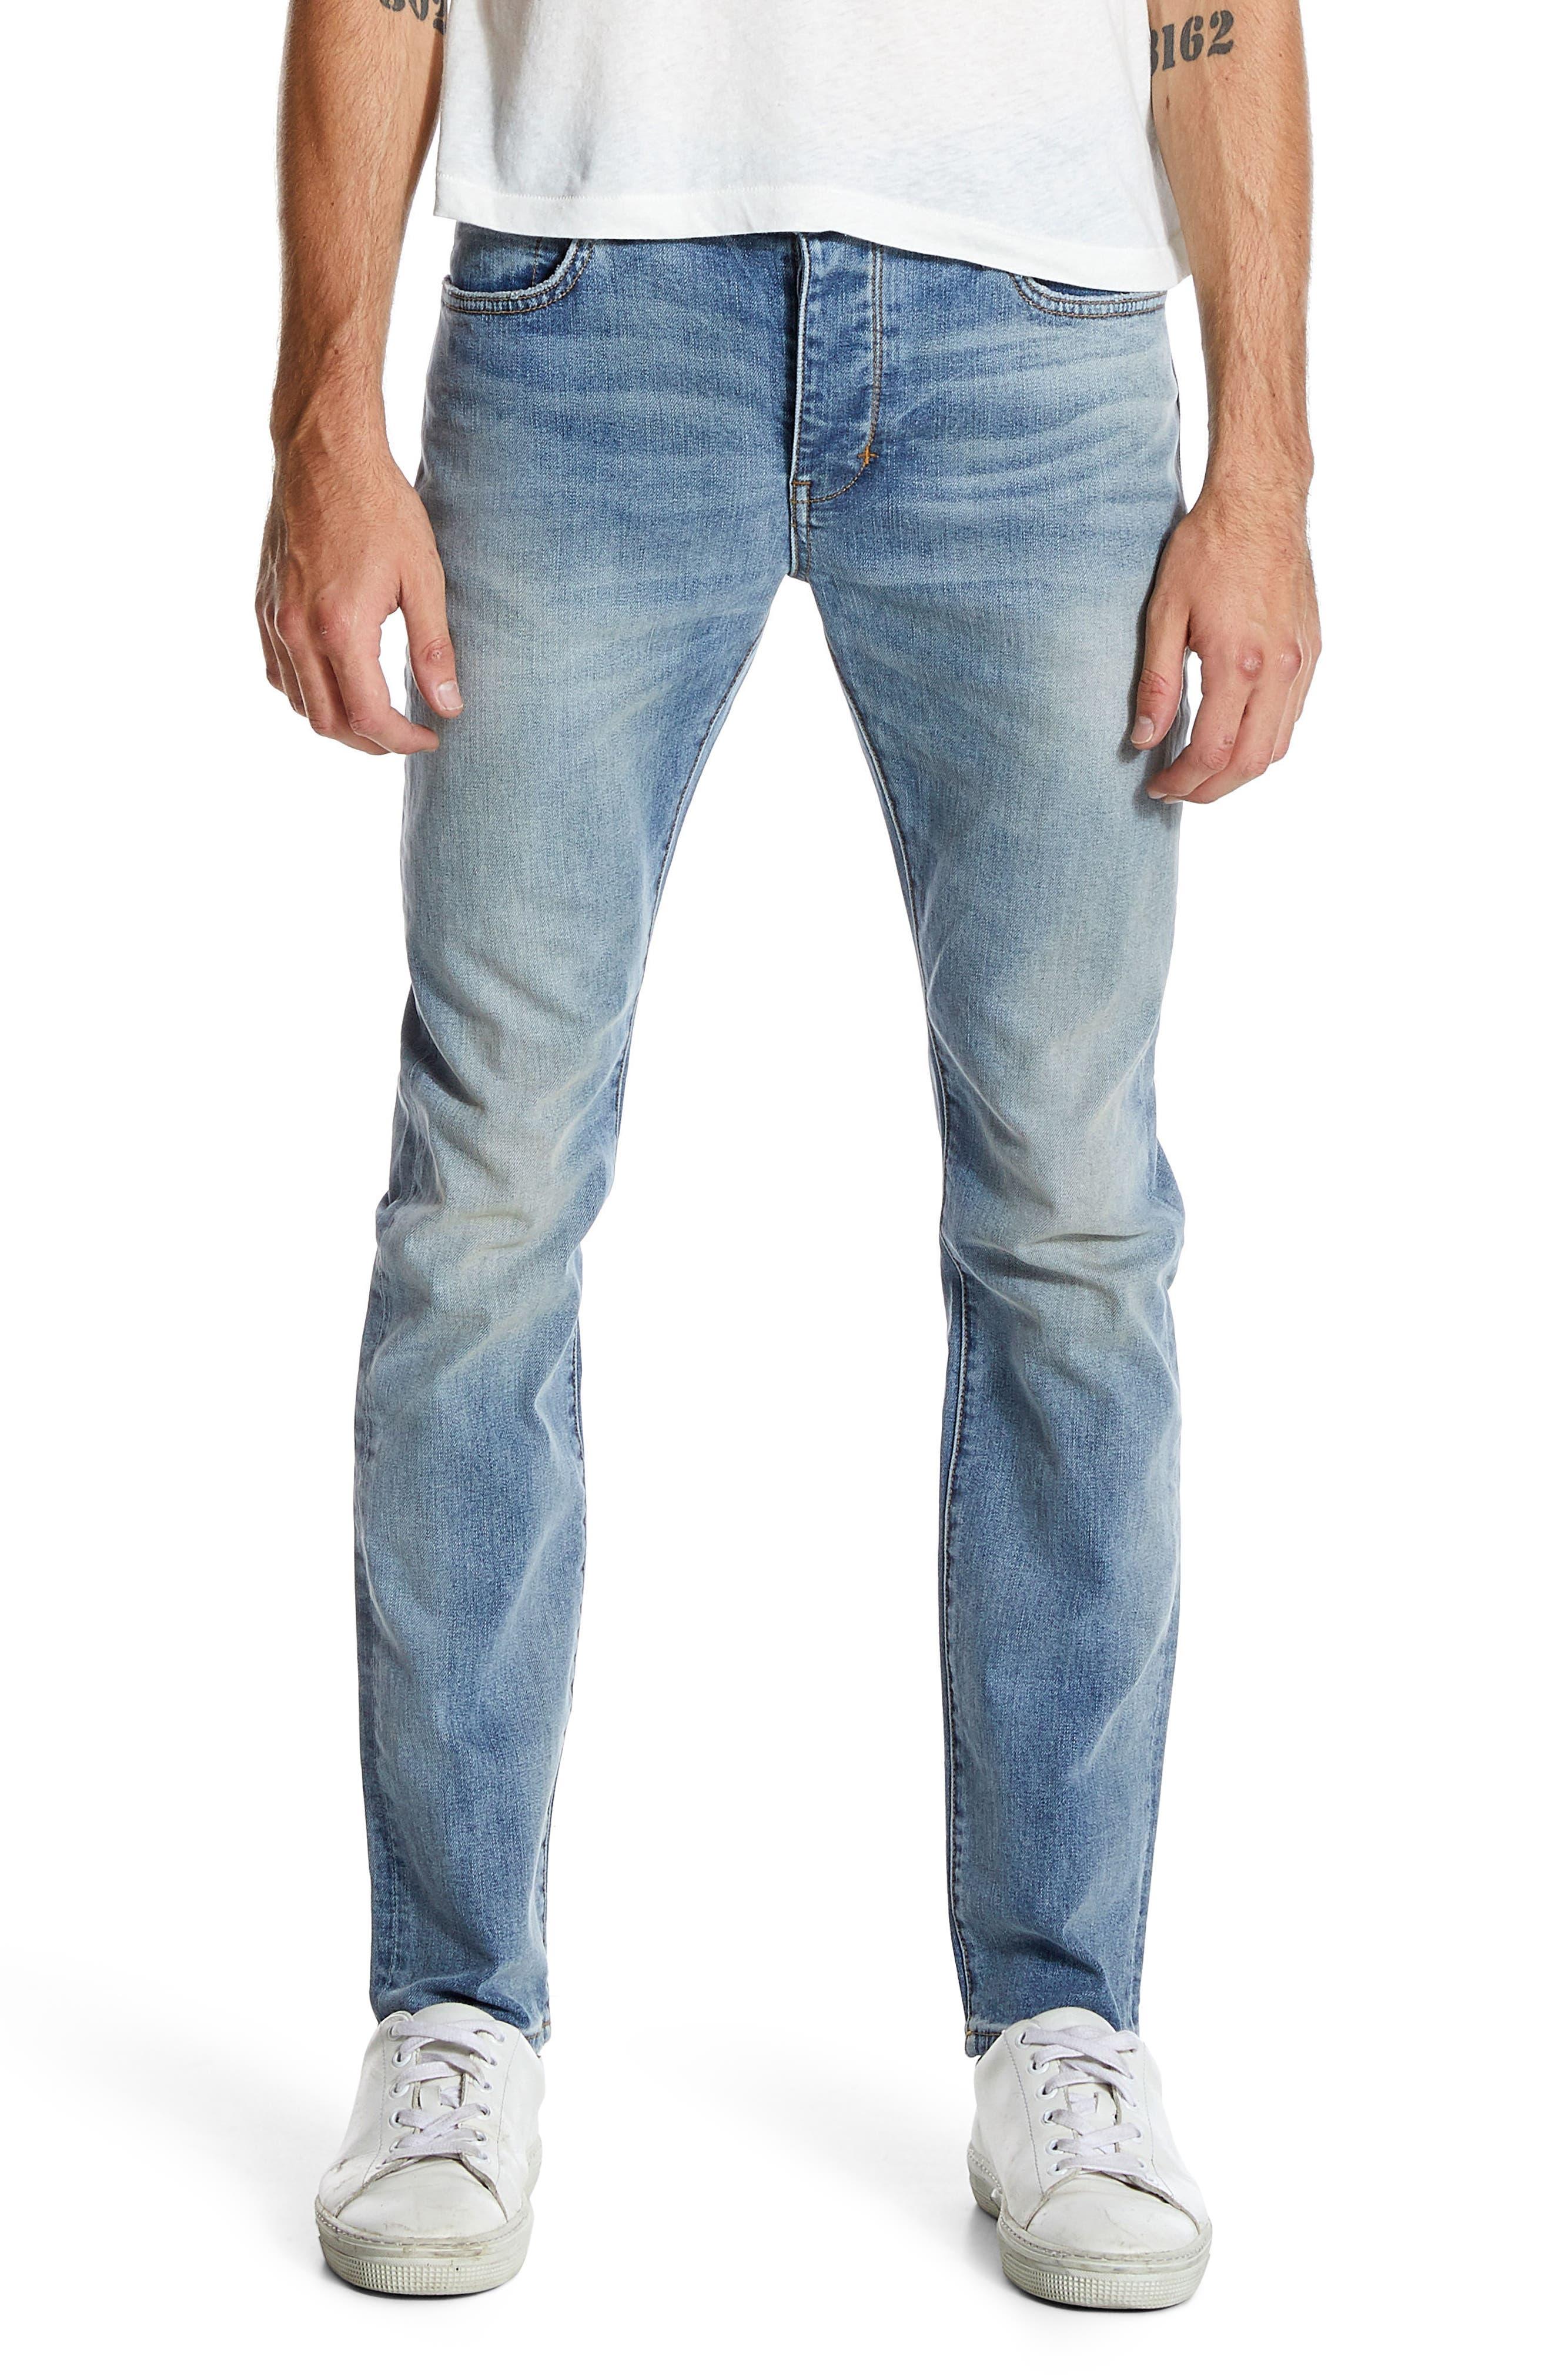 Iggy Skinny Fit Jeans,                             Main thumbnail 1, color,                             Atomic Airwash